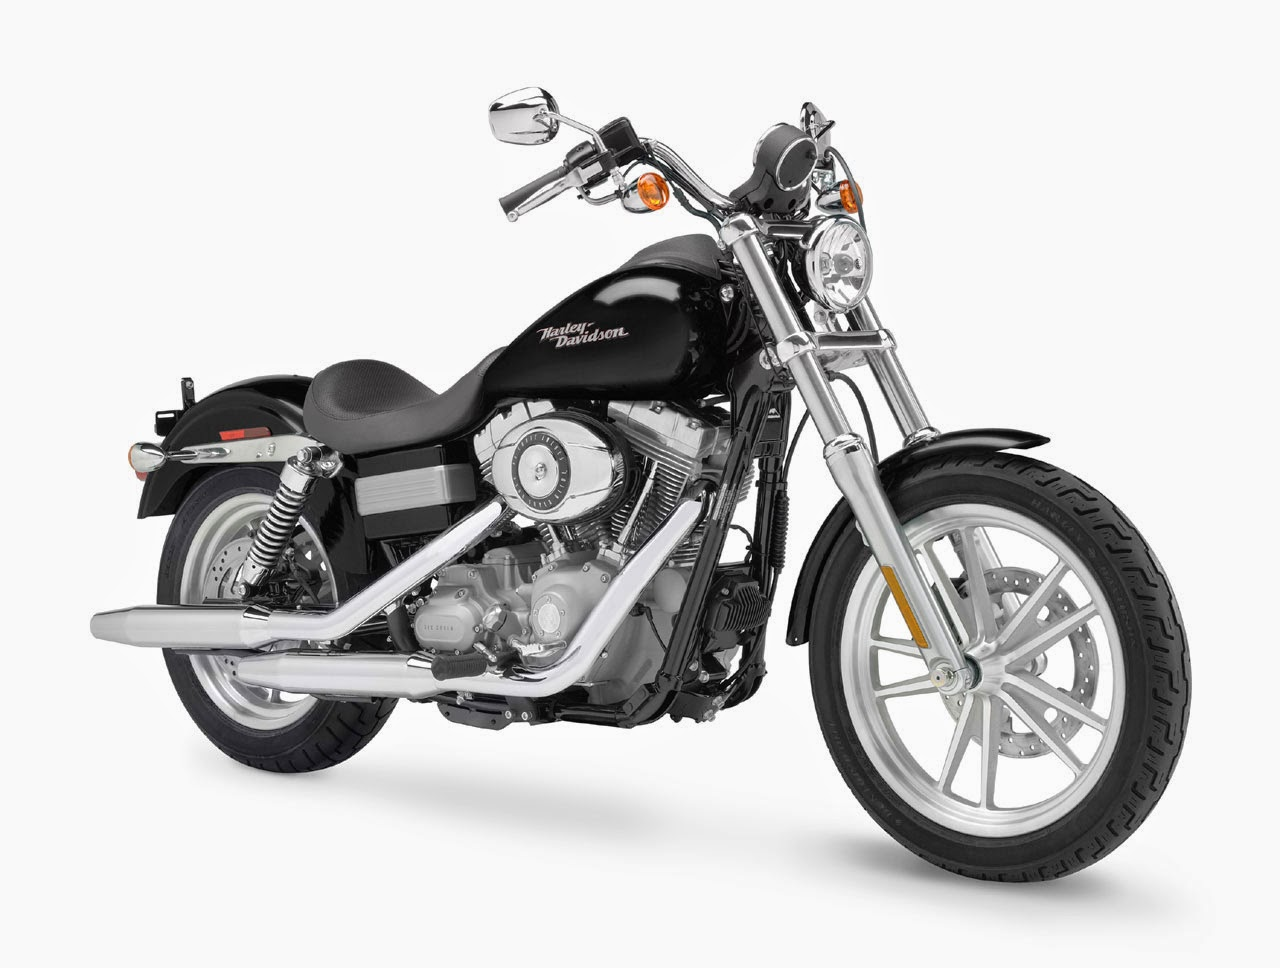 2006 Harley Davidson Dyna Super Glide Service Manual border=